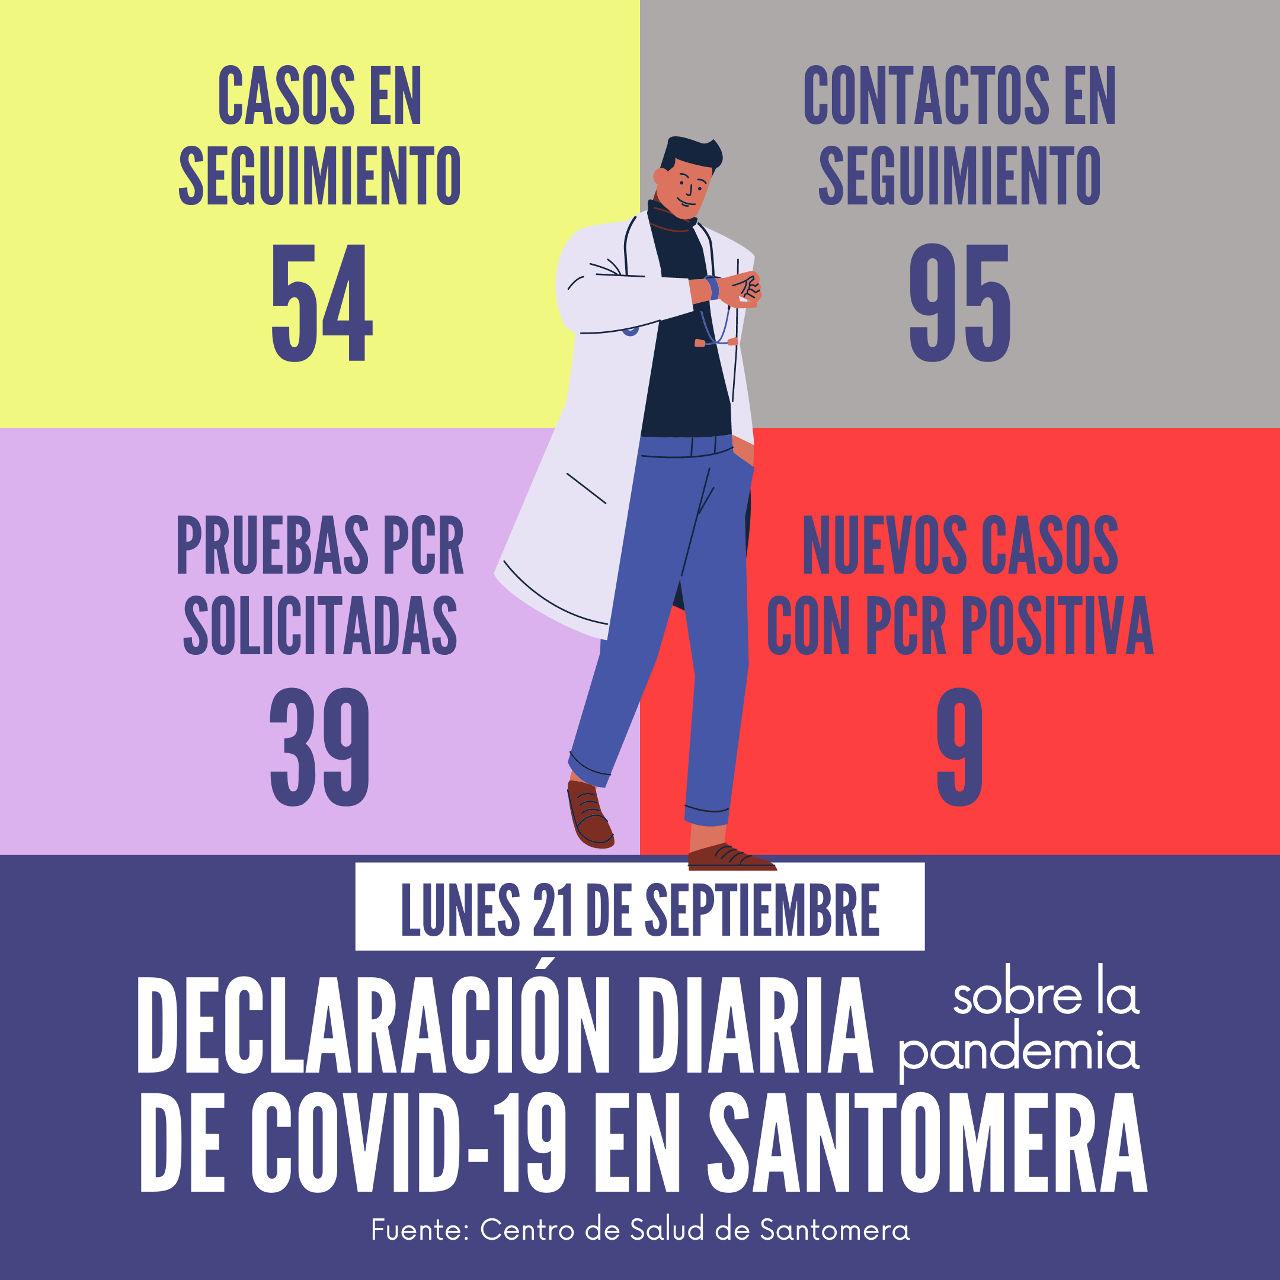 20200921_Datos COVID-19 Santomera